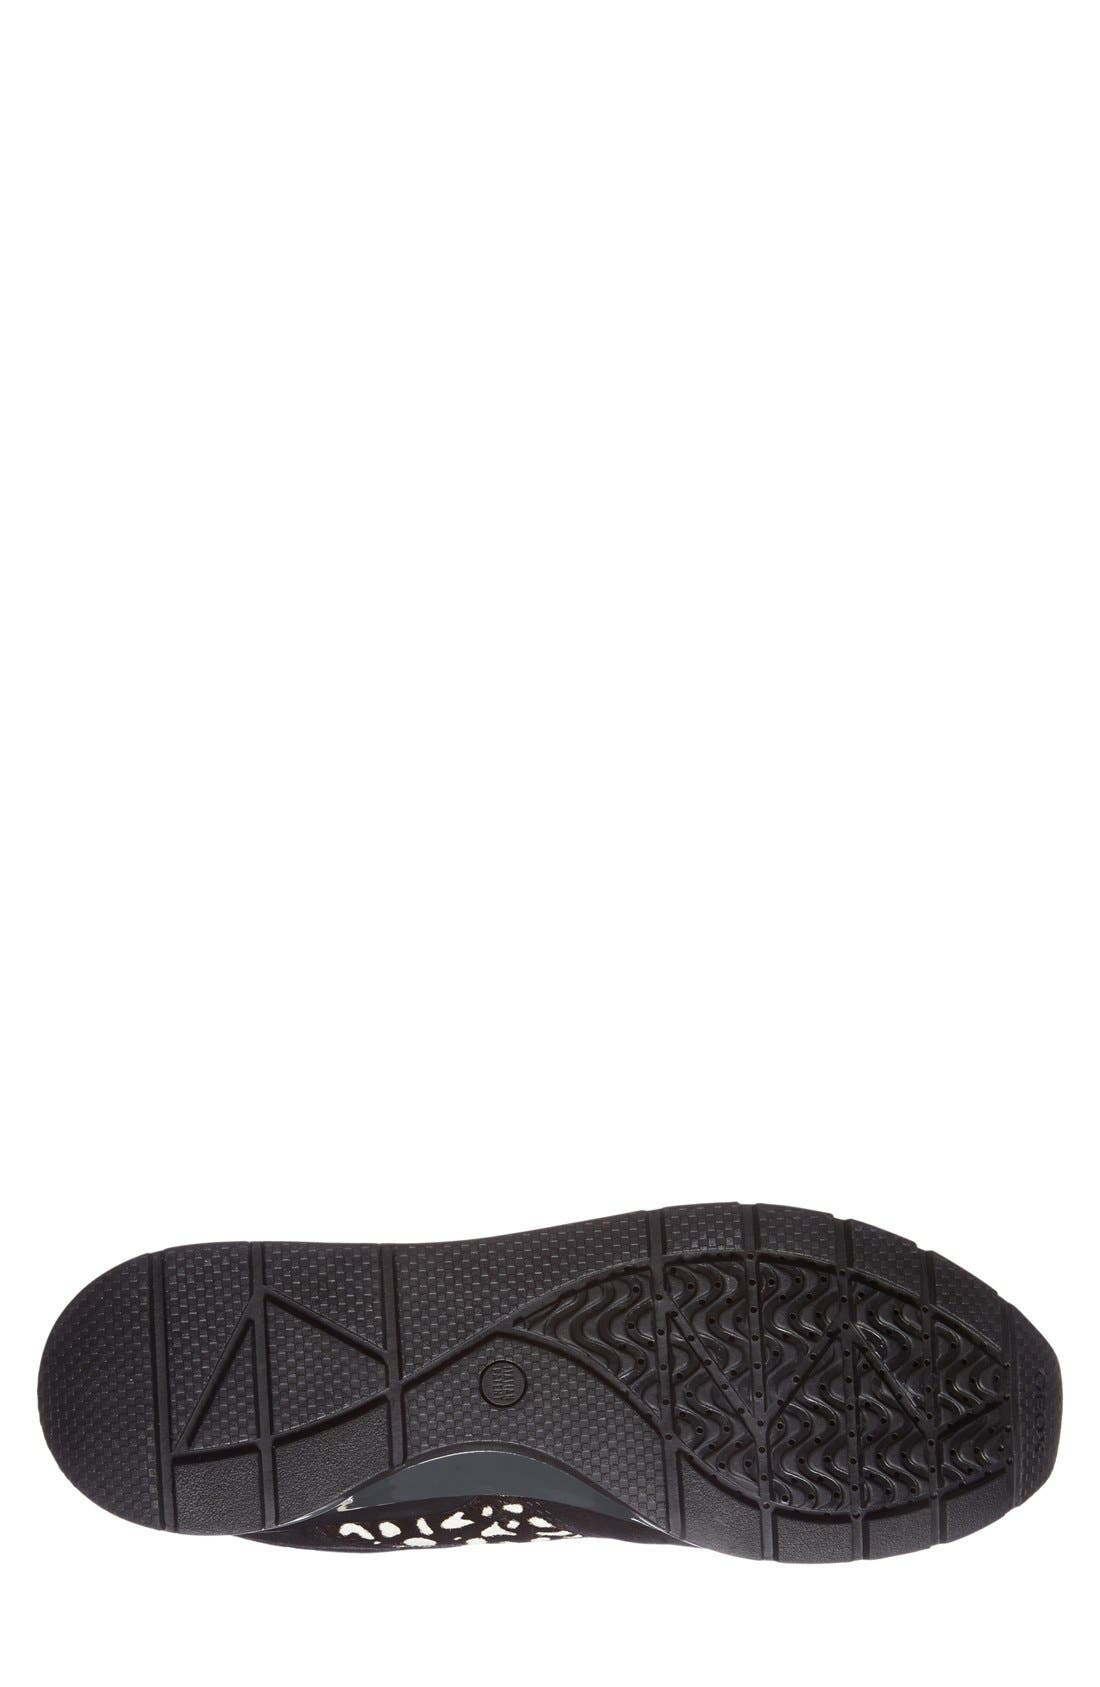 'Shahira' Sneaker,                             Alternate thumbnail 4, color,                             001